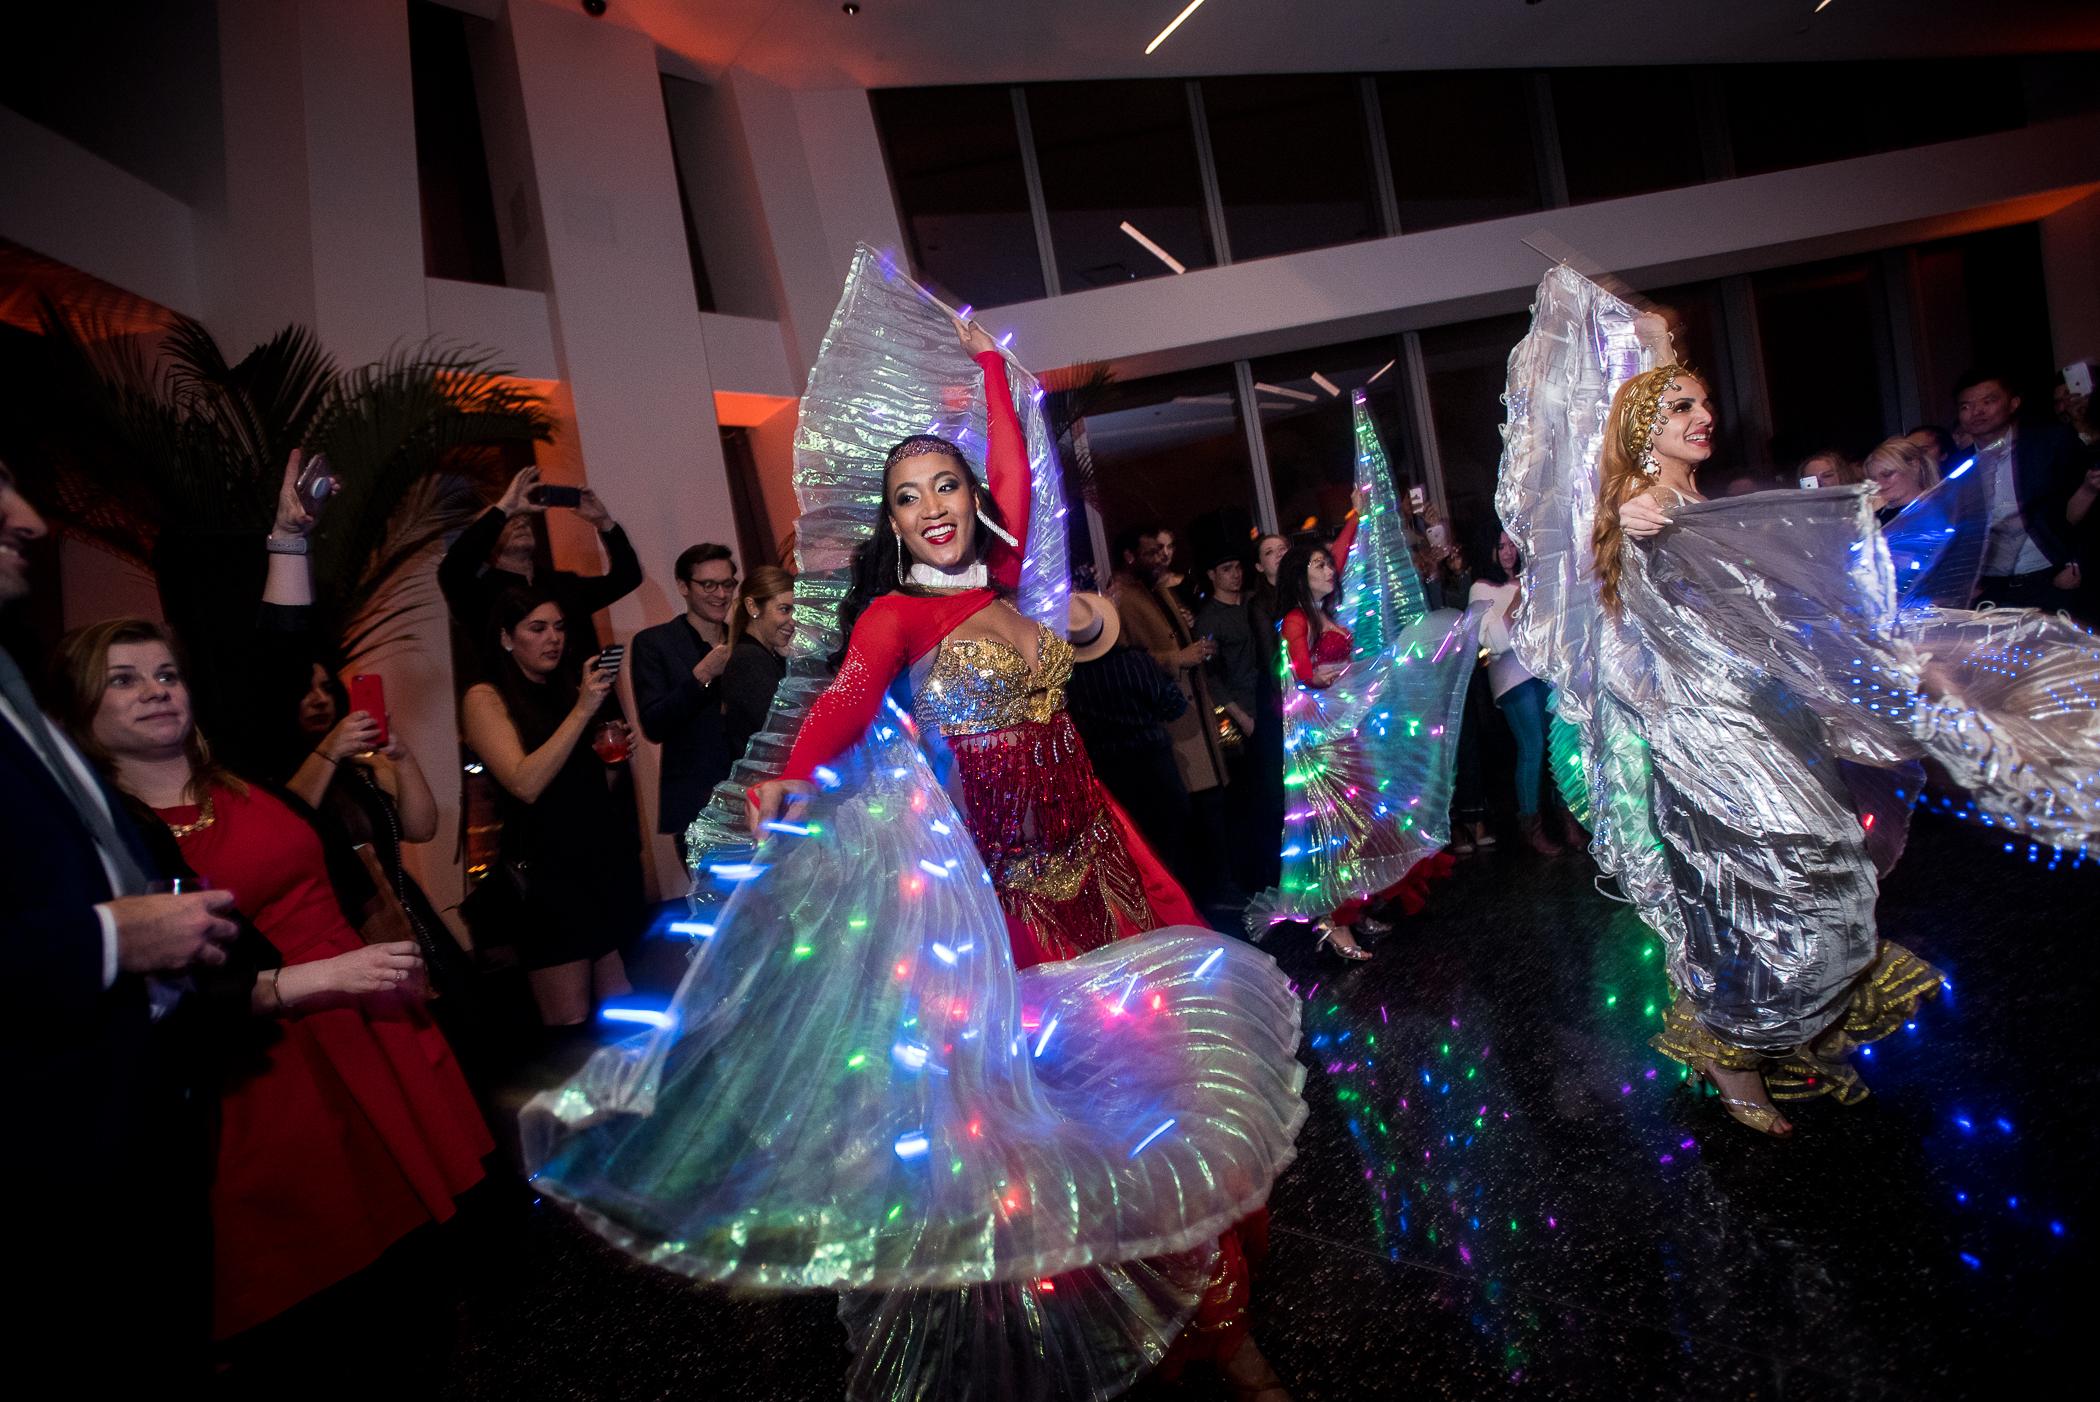 LED Wing Dancers